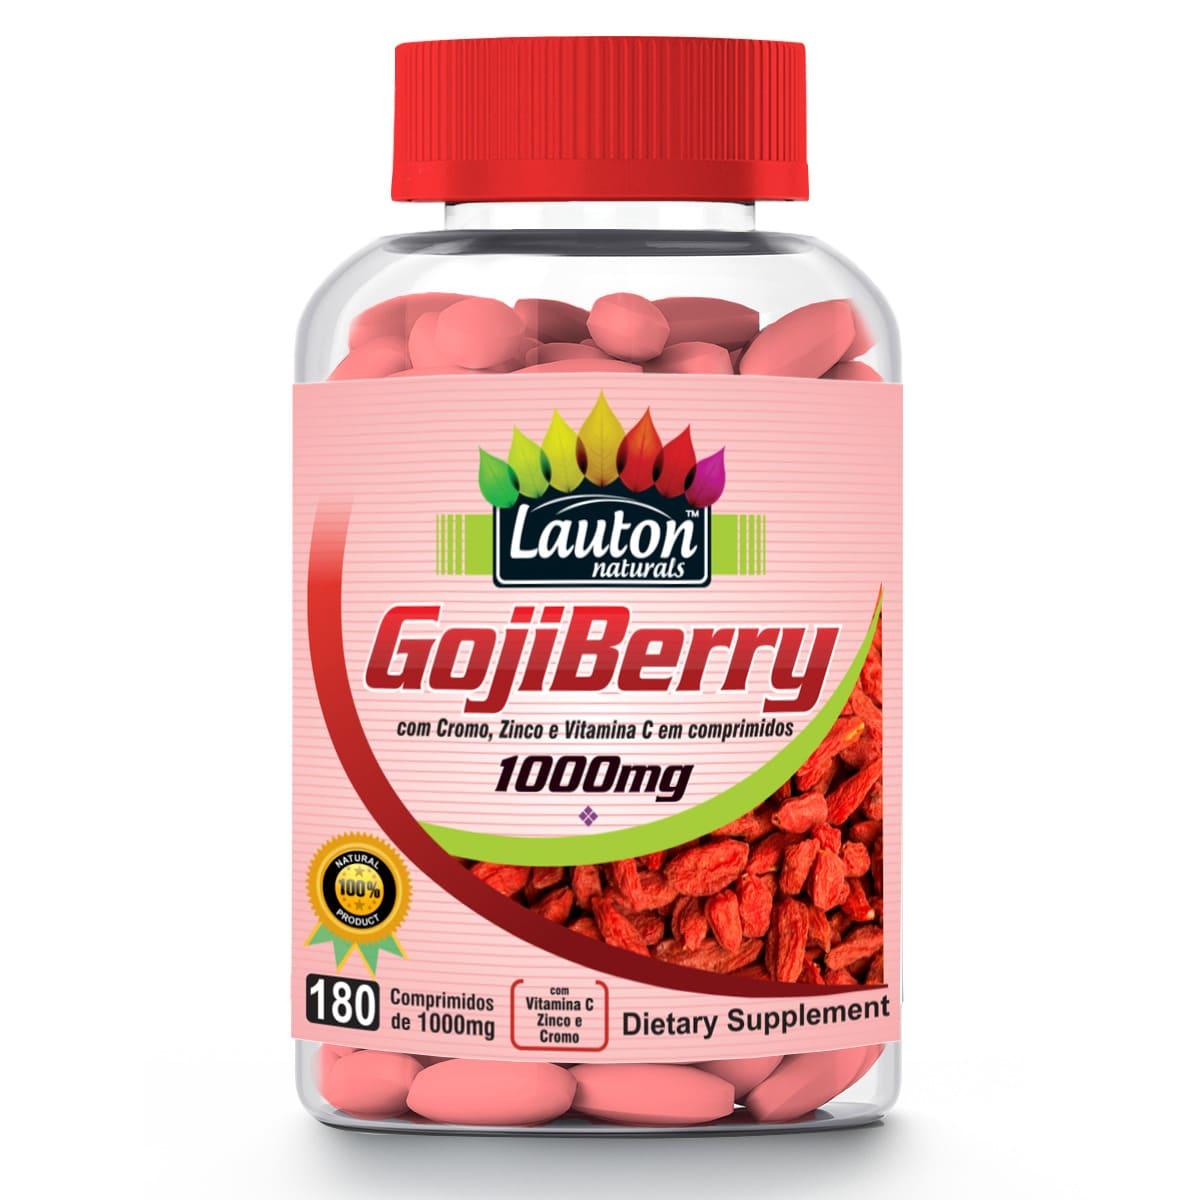 Goji Berry Lauton Nutrition 180 Comprimidos 1000mg